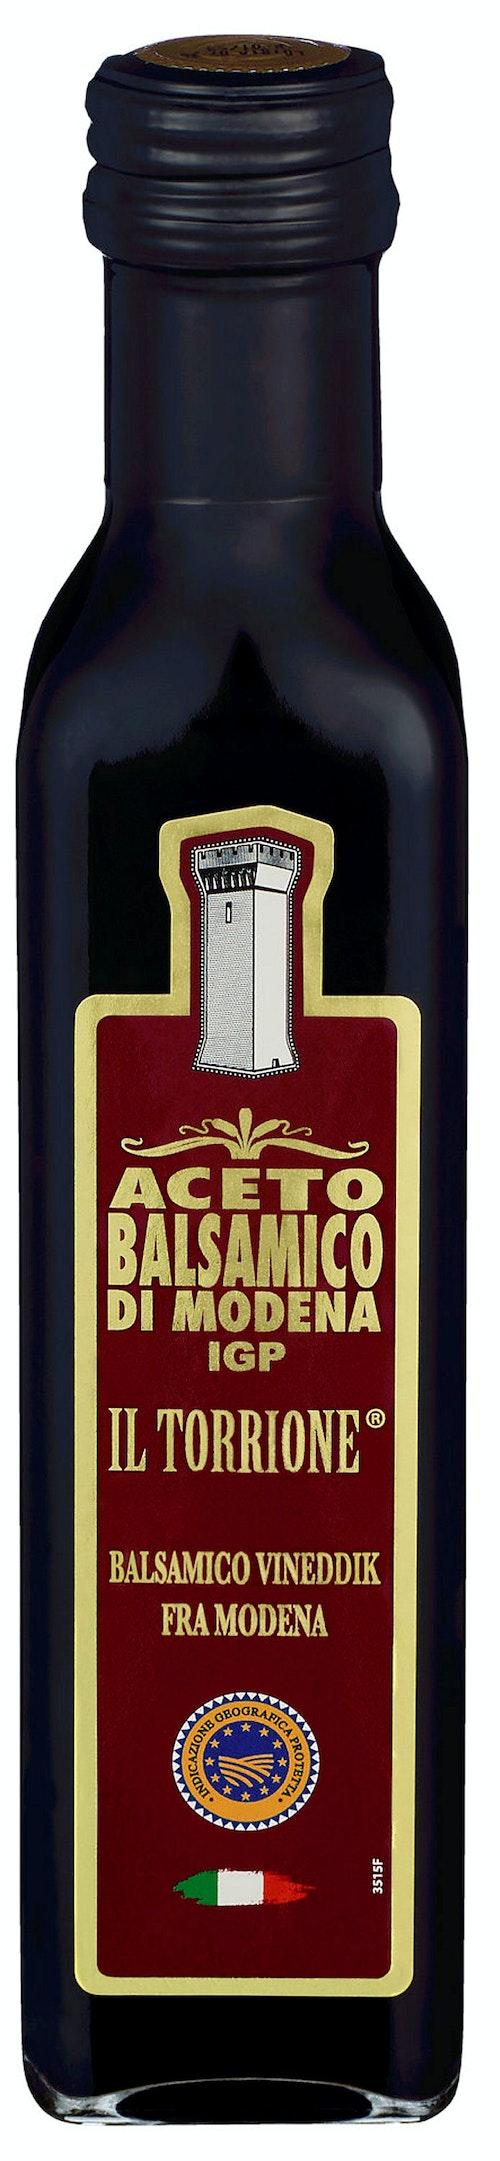 Il Torrione Balsamico Vineddik 0,25 l